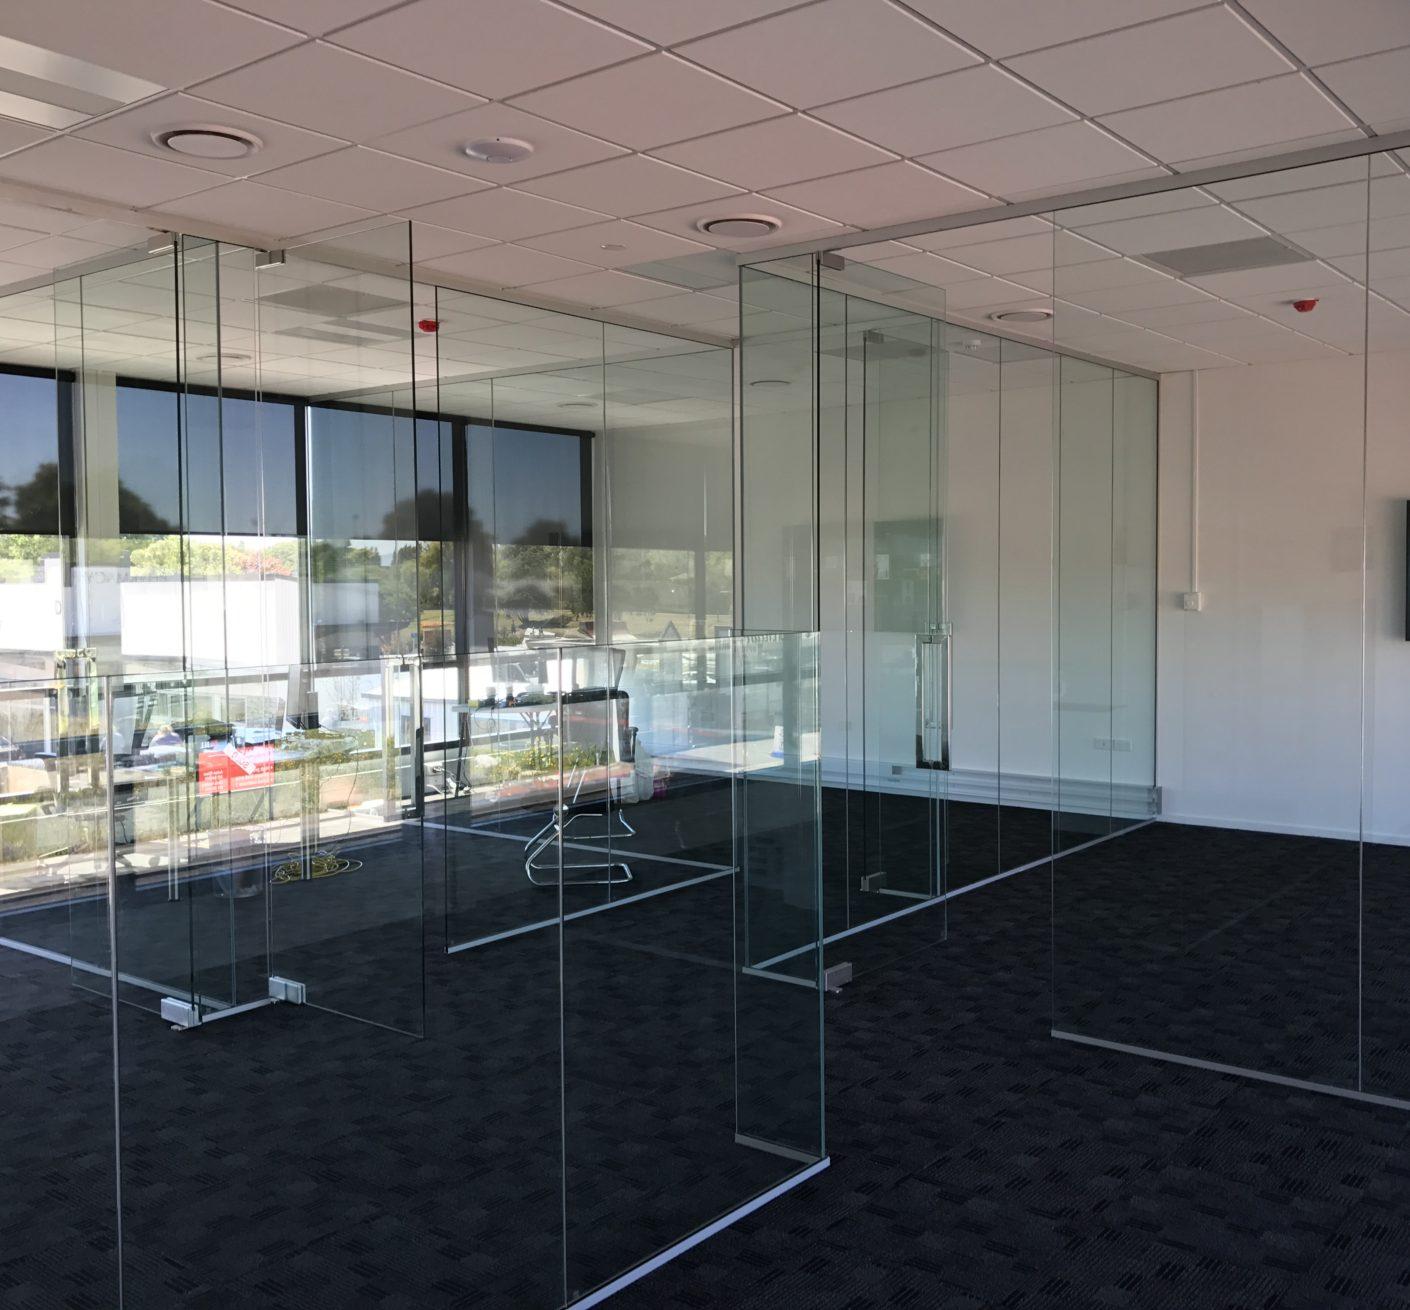 NZ Frameless Glass, South Island, Metro Glass, Christchurch Glass, Prestige Glass, Canterbury Glass, Shower Glass, Showers, Balustrades, Frameless Glass, Stake Glass, Commercial Glass, Christchurch Glass